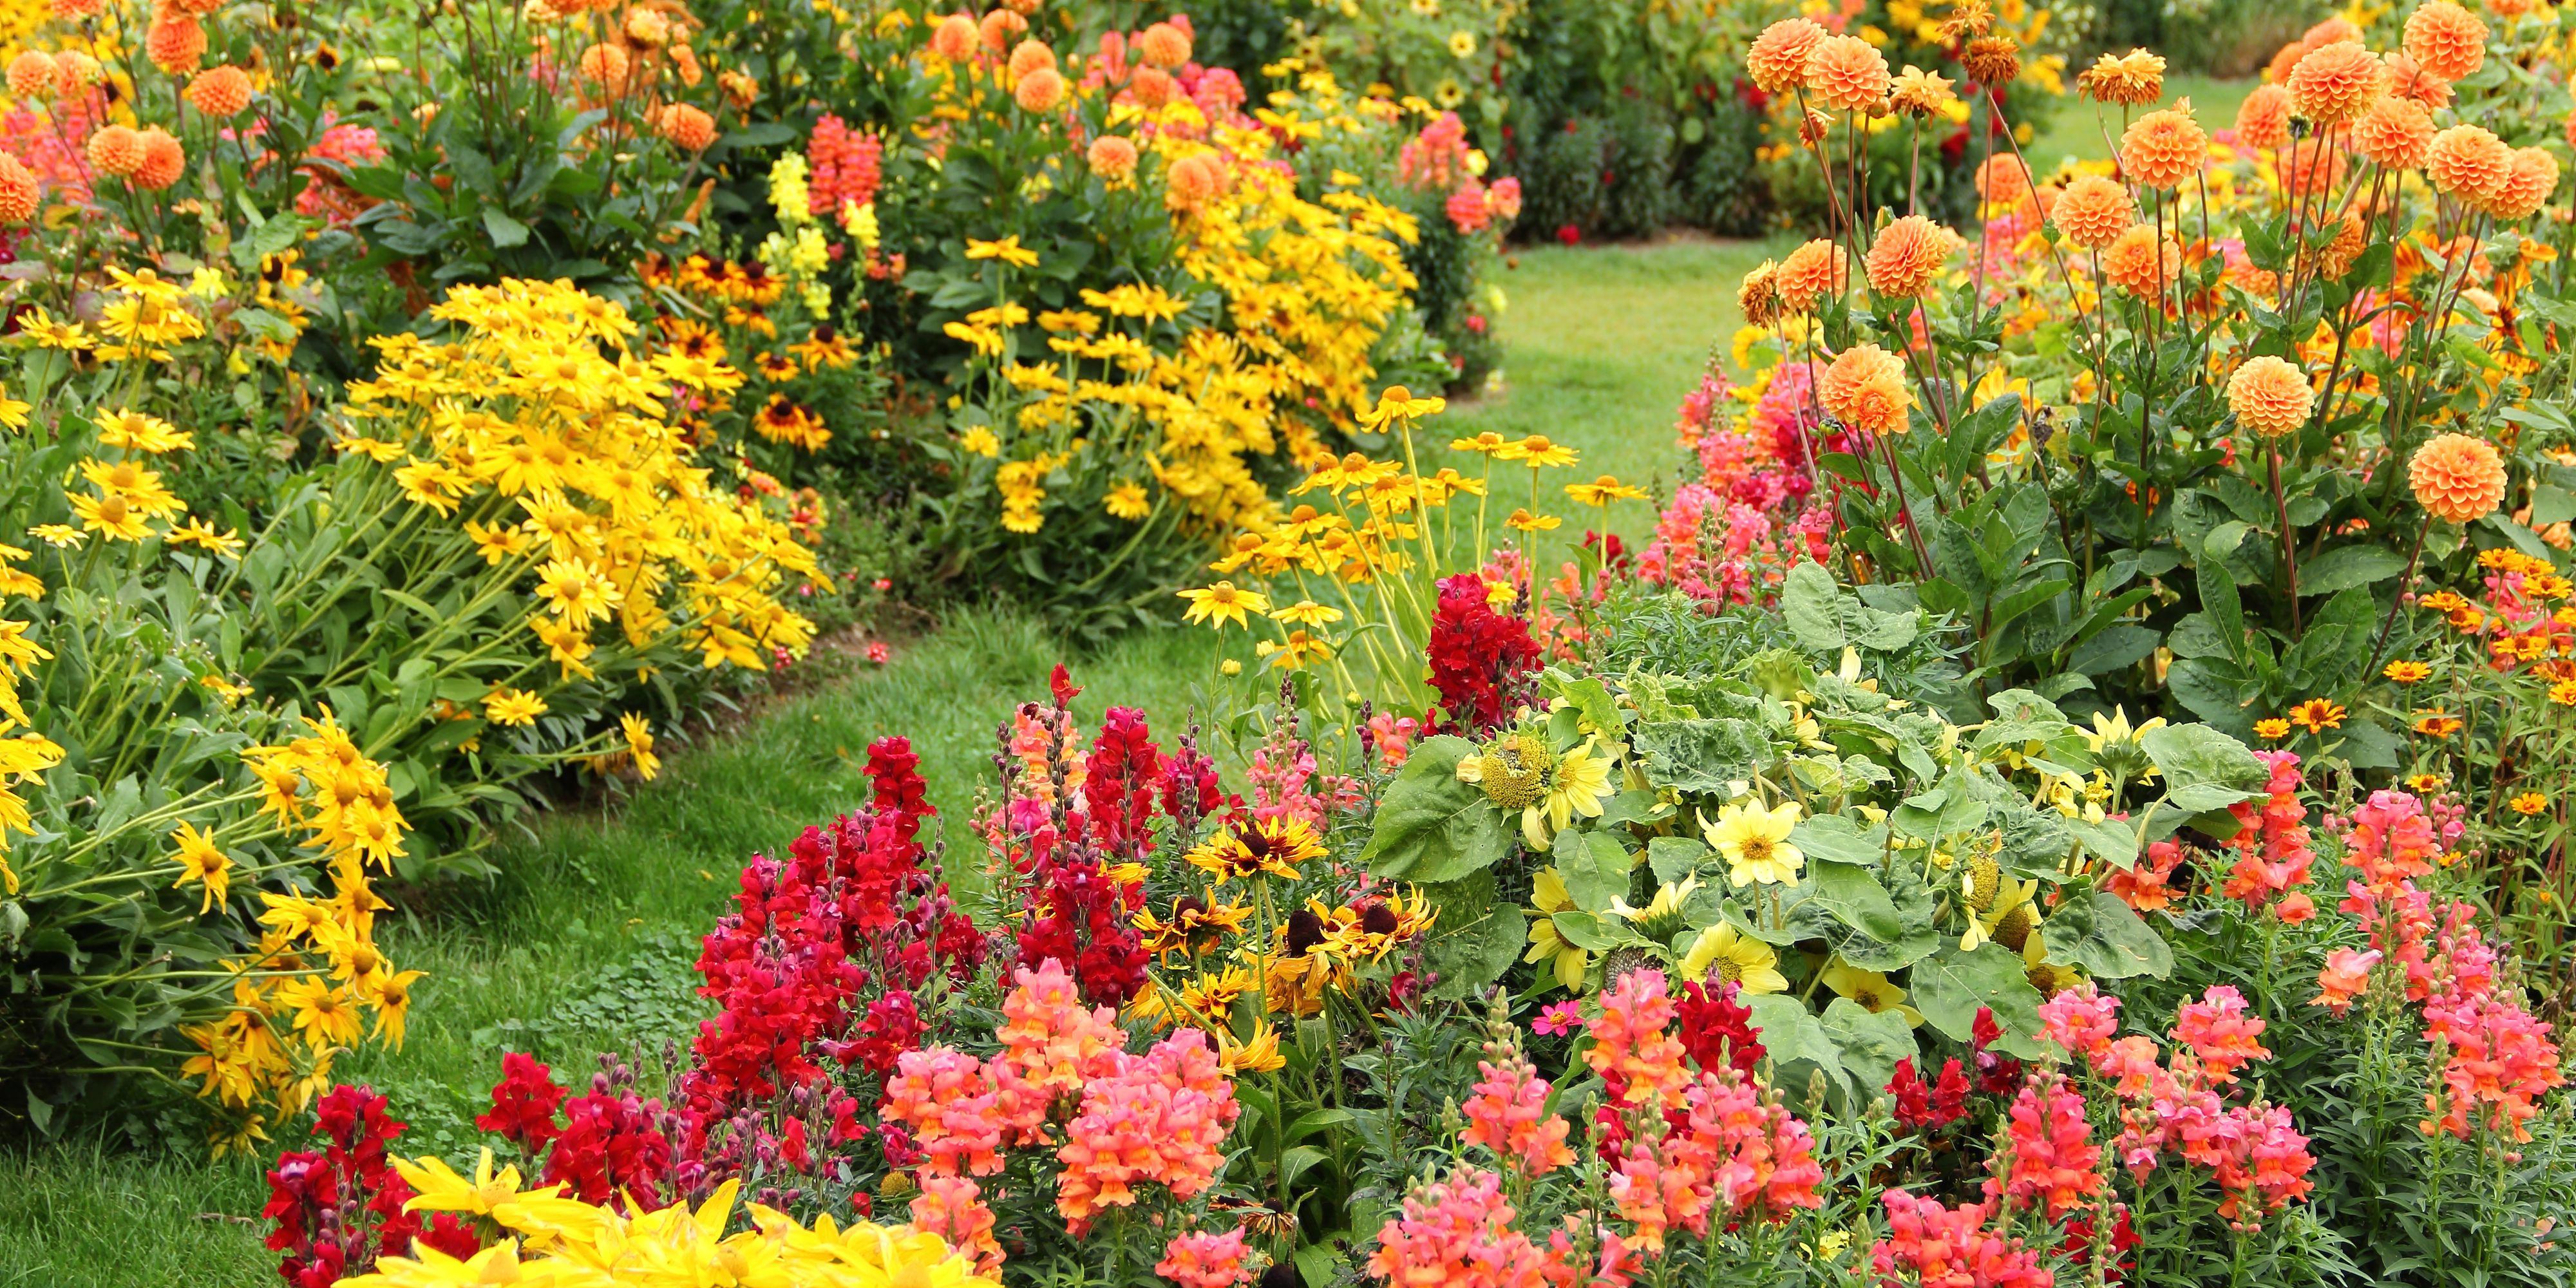 15 Best Fall Flowers Plants Flowers That Bloom in Autumn